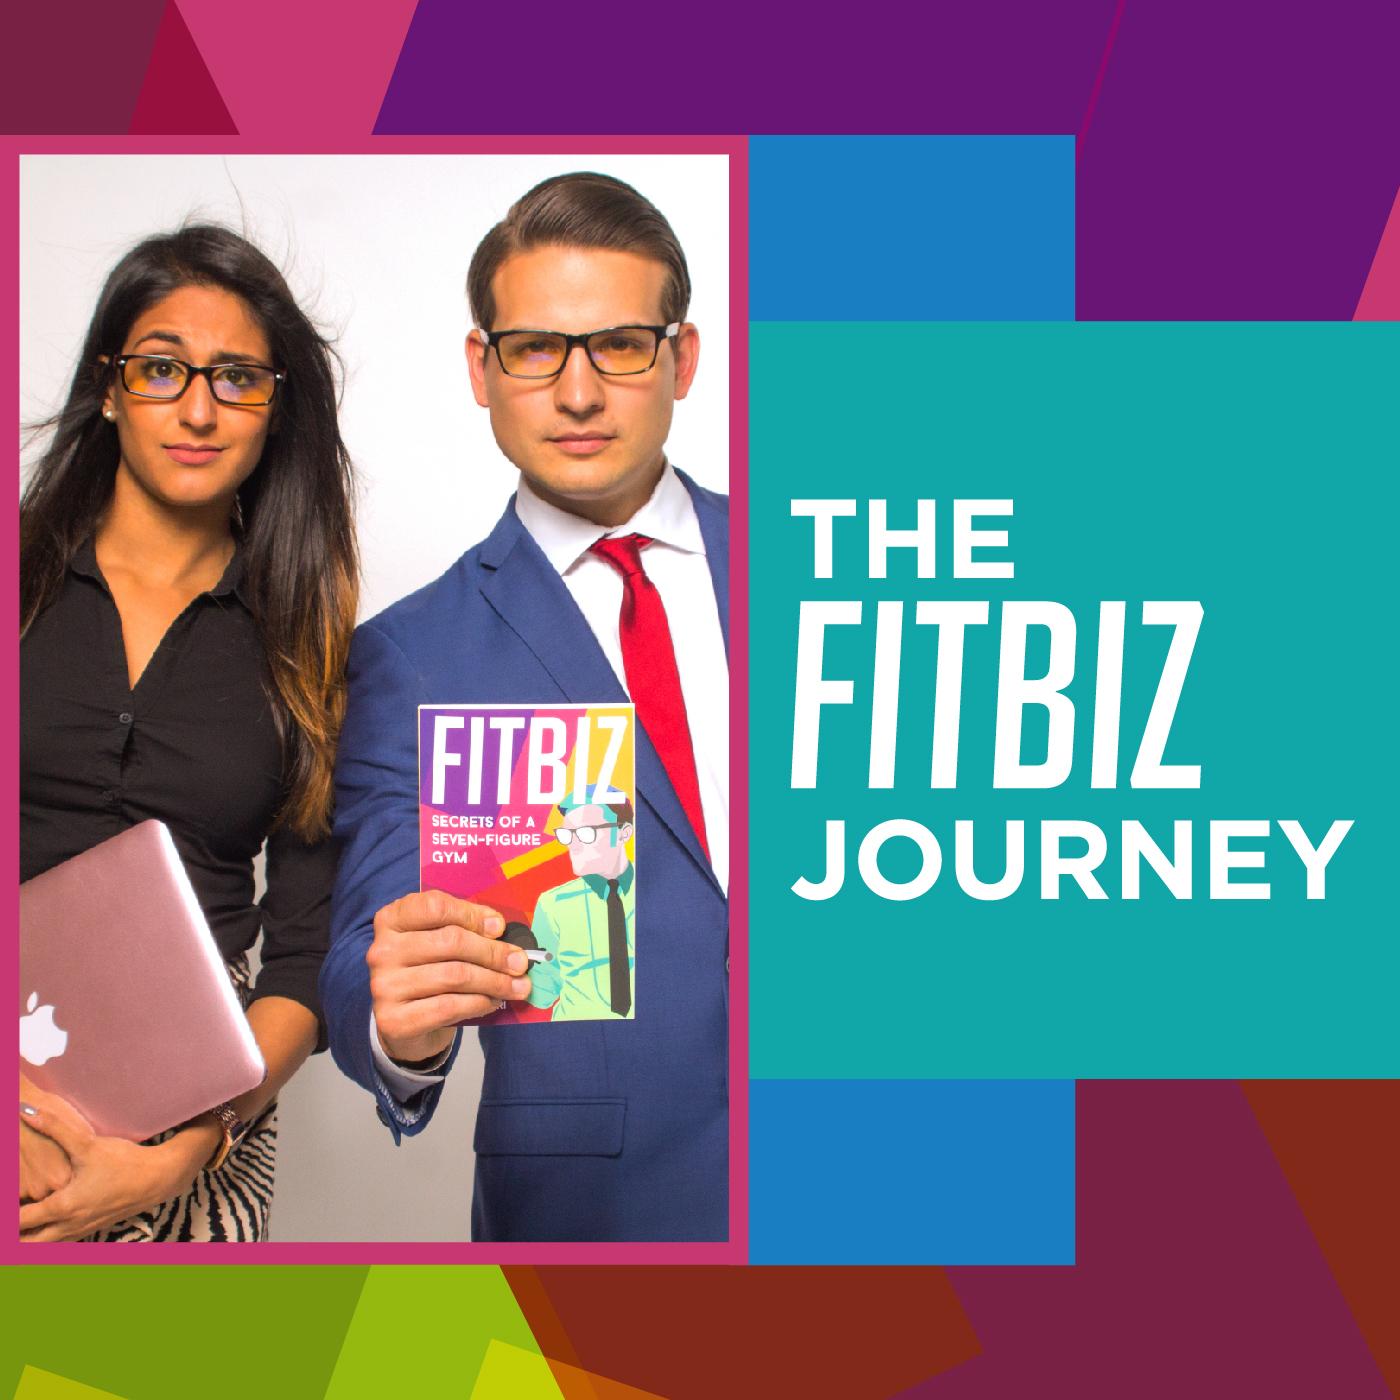 FidBiz_Podcast Daniel Nyiri and Parita Patel